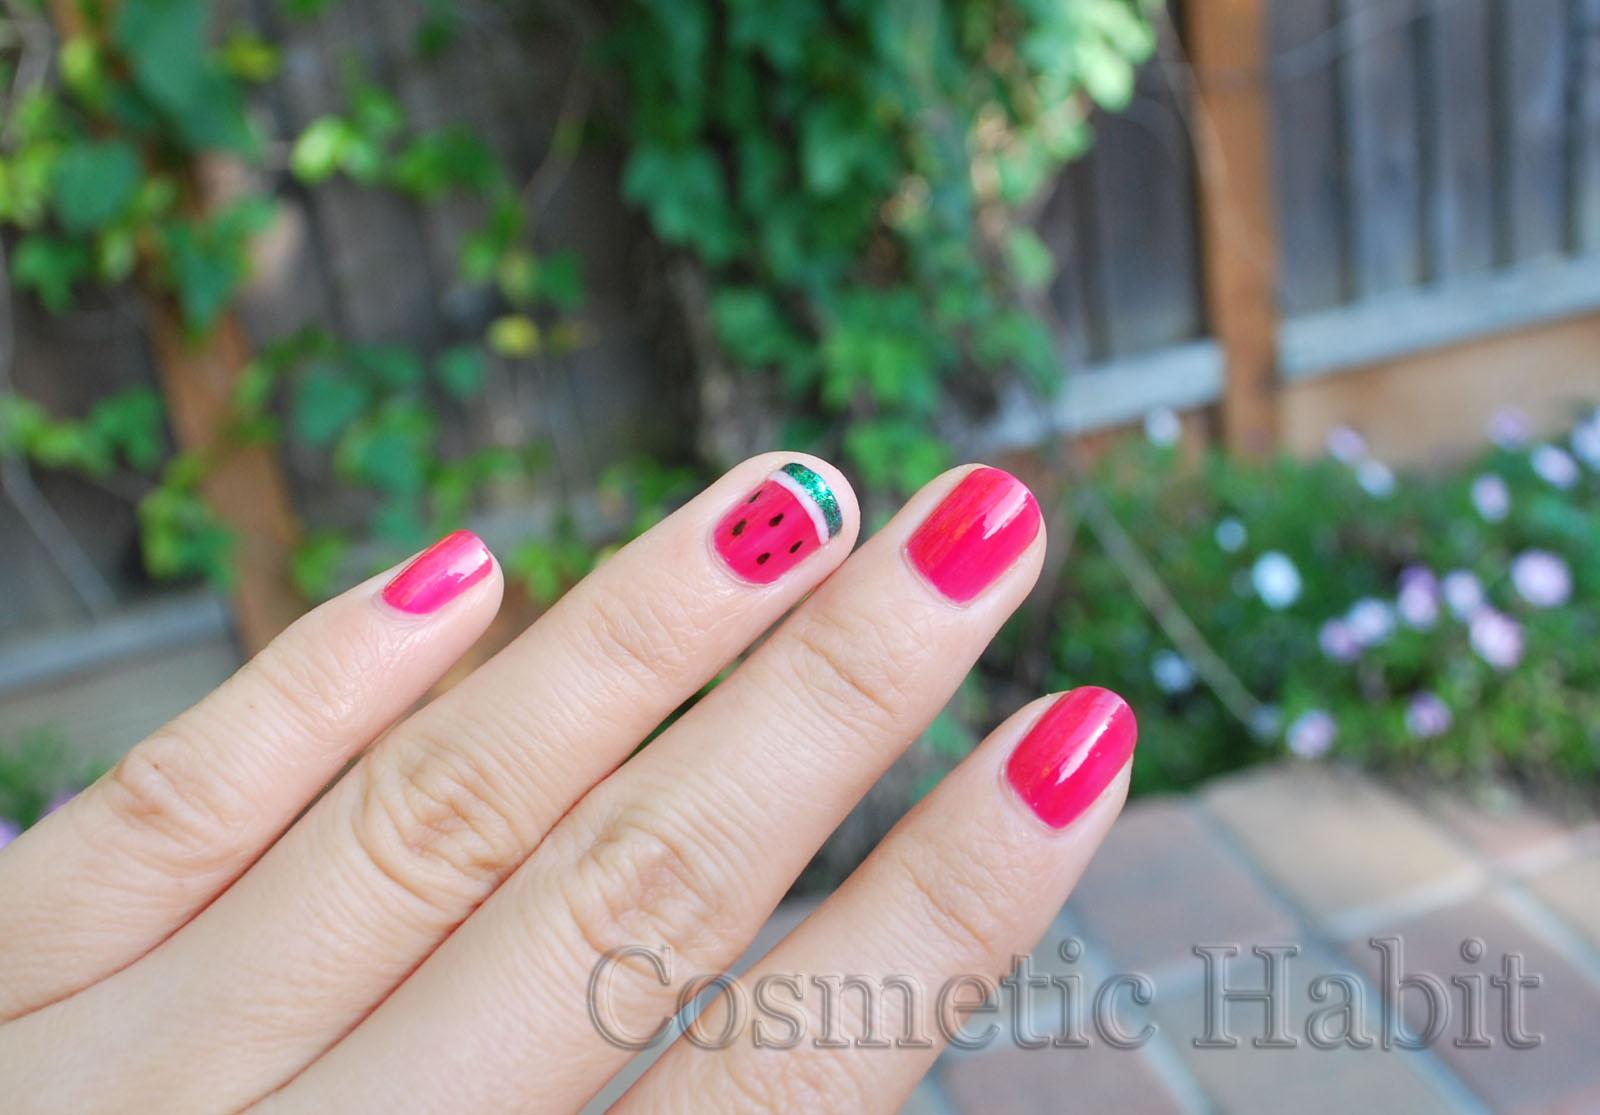 Cosmetic Habit: Watermelon Nail Art Design: Photos, Swatches